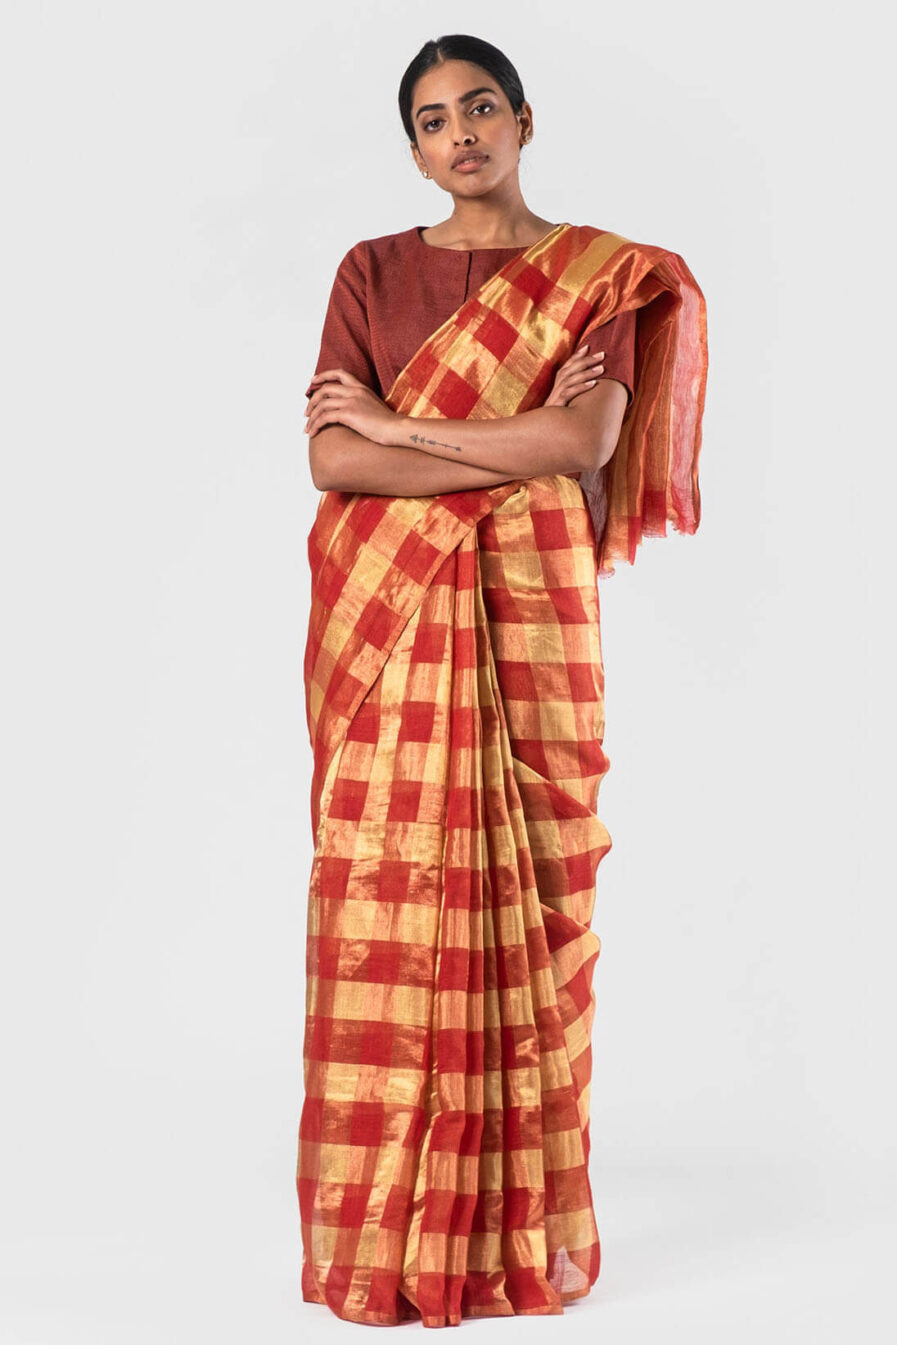 Anavila Red Gold checkered sari